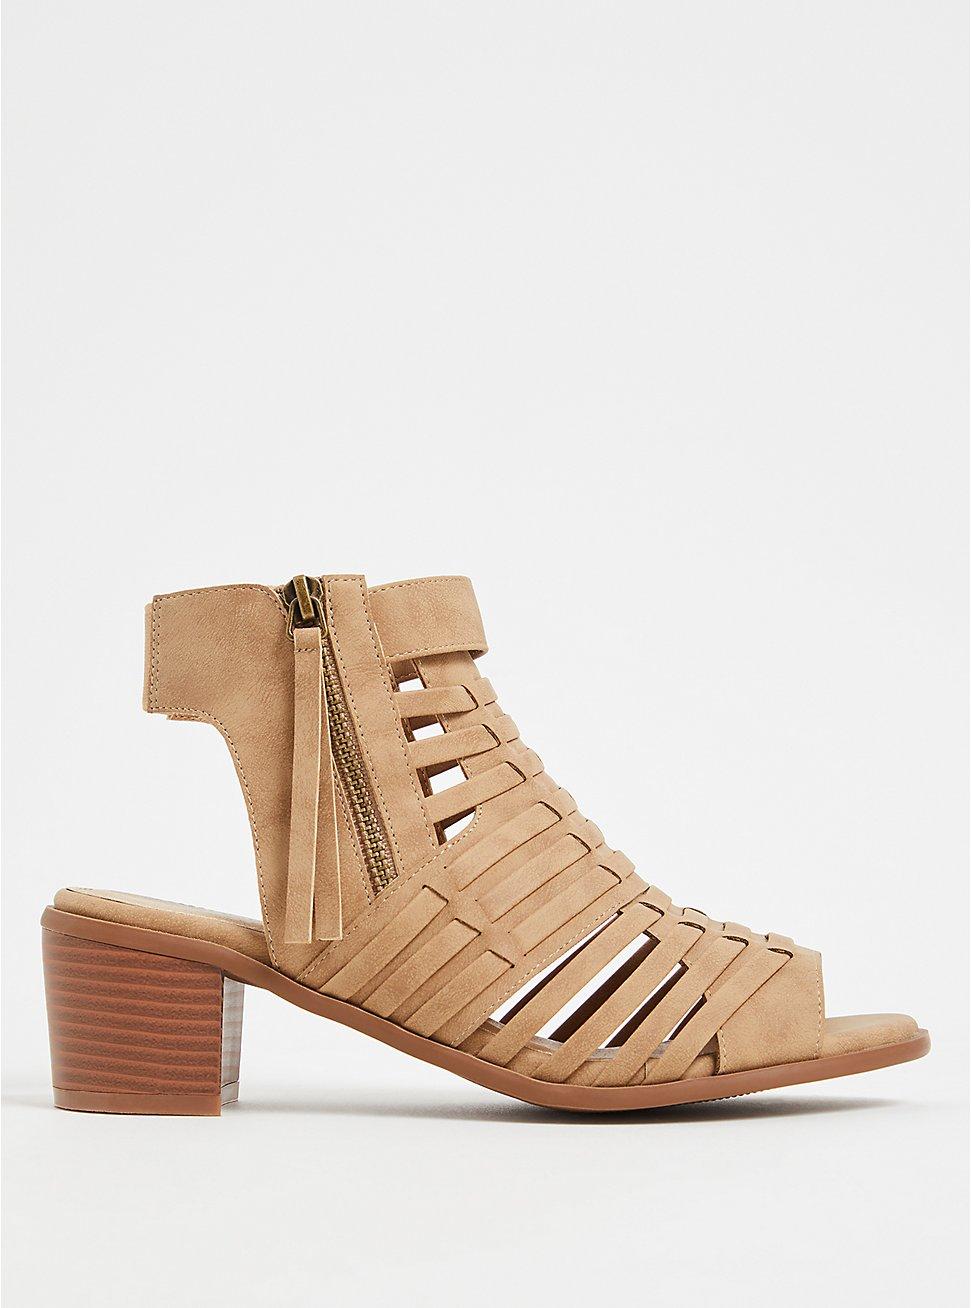 Tan Faux Leather Woven Block Heel (WW), TAN/BEIGE, hi-res